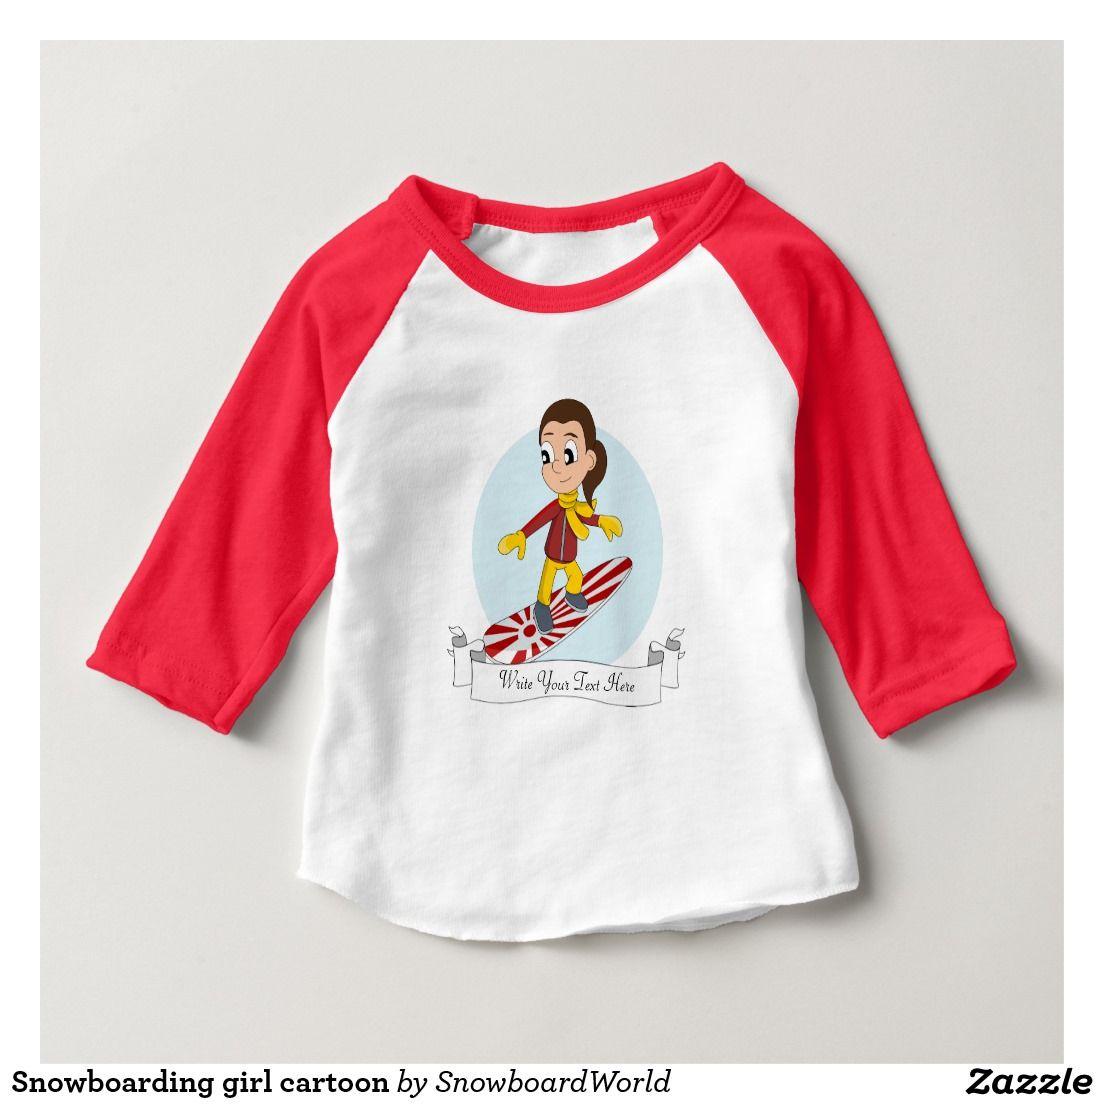 a970bec0677b Snowboarding girl cartoon tshirts